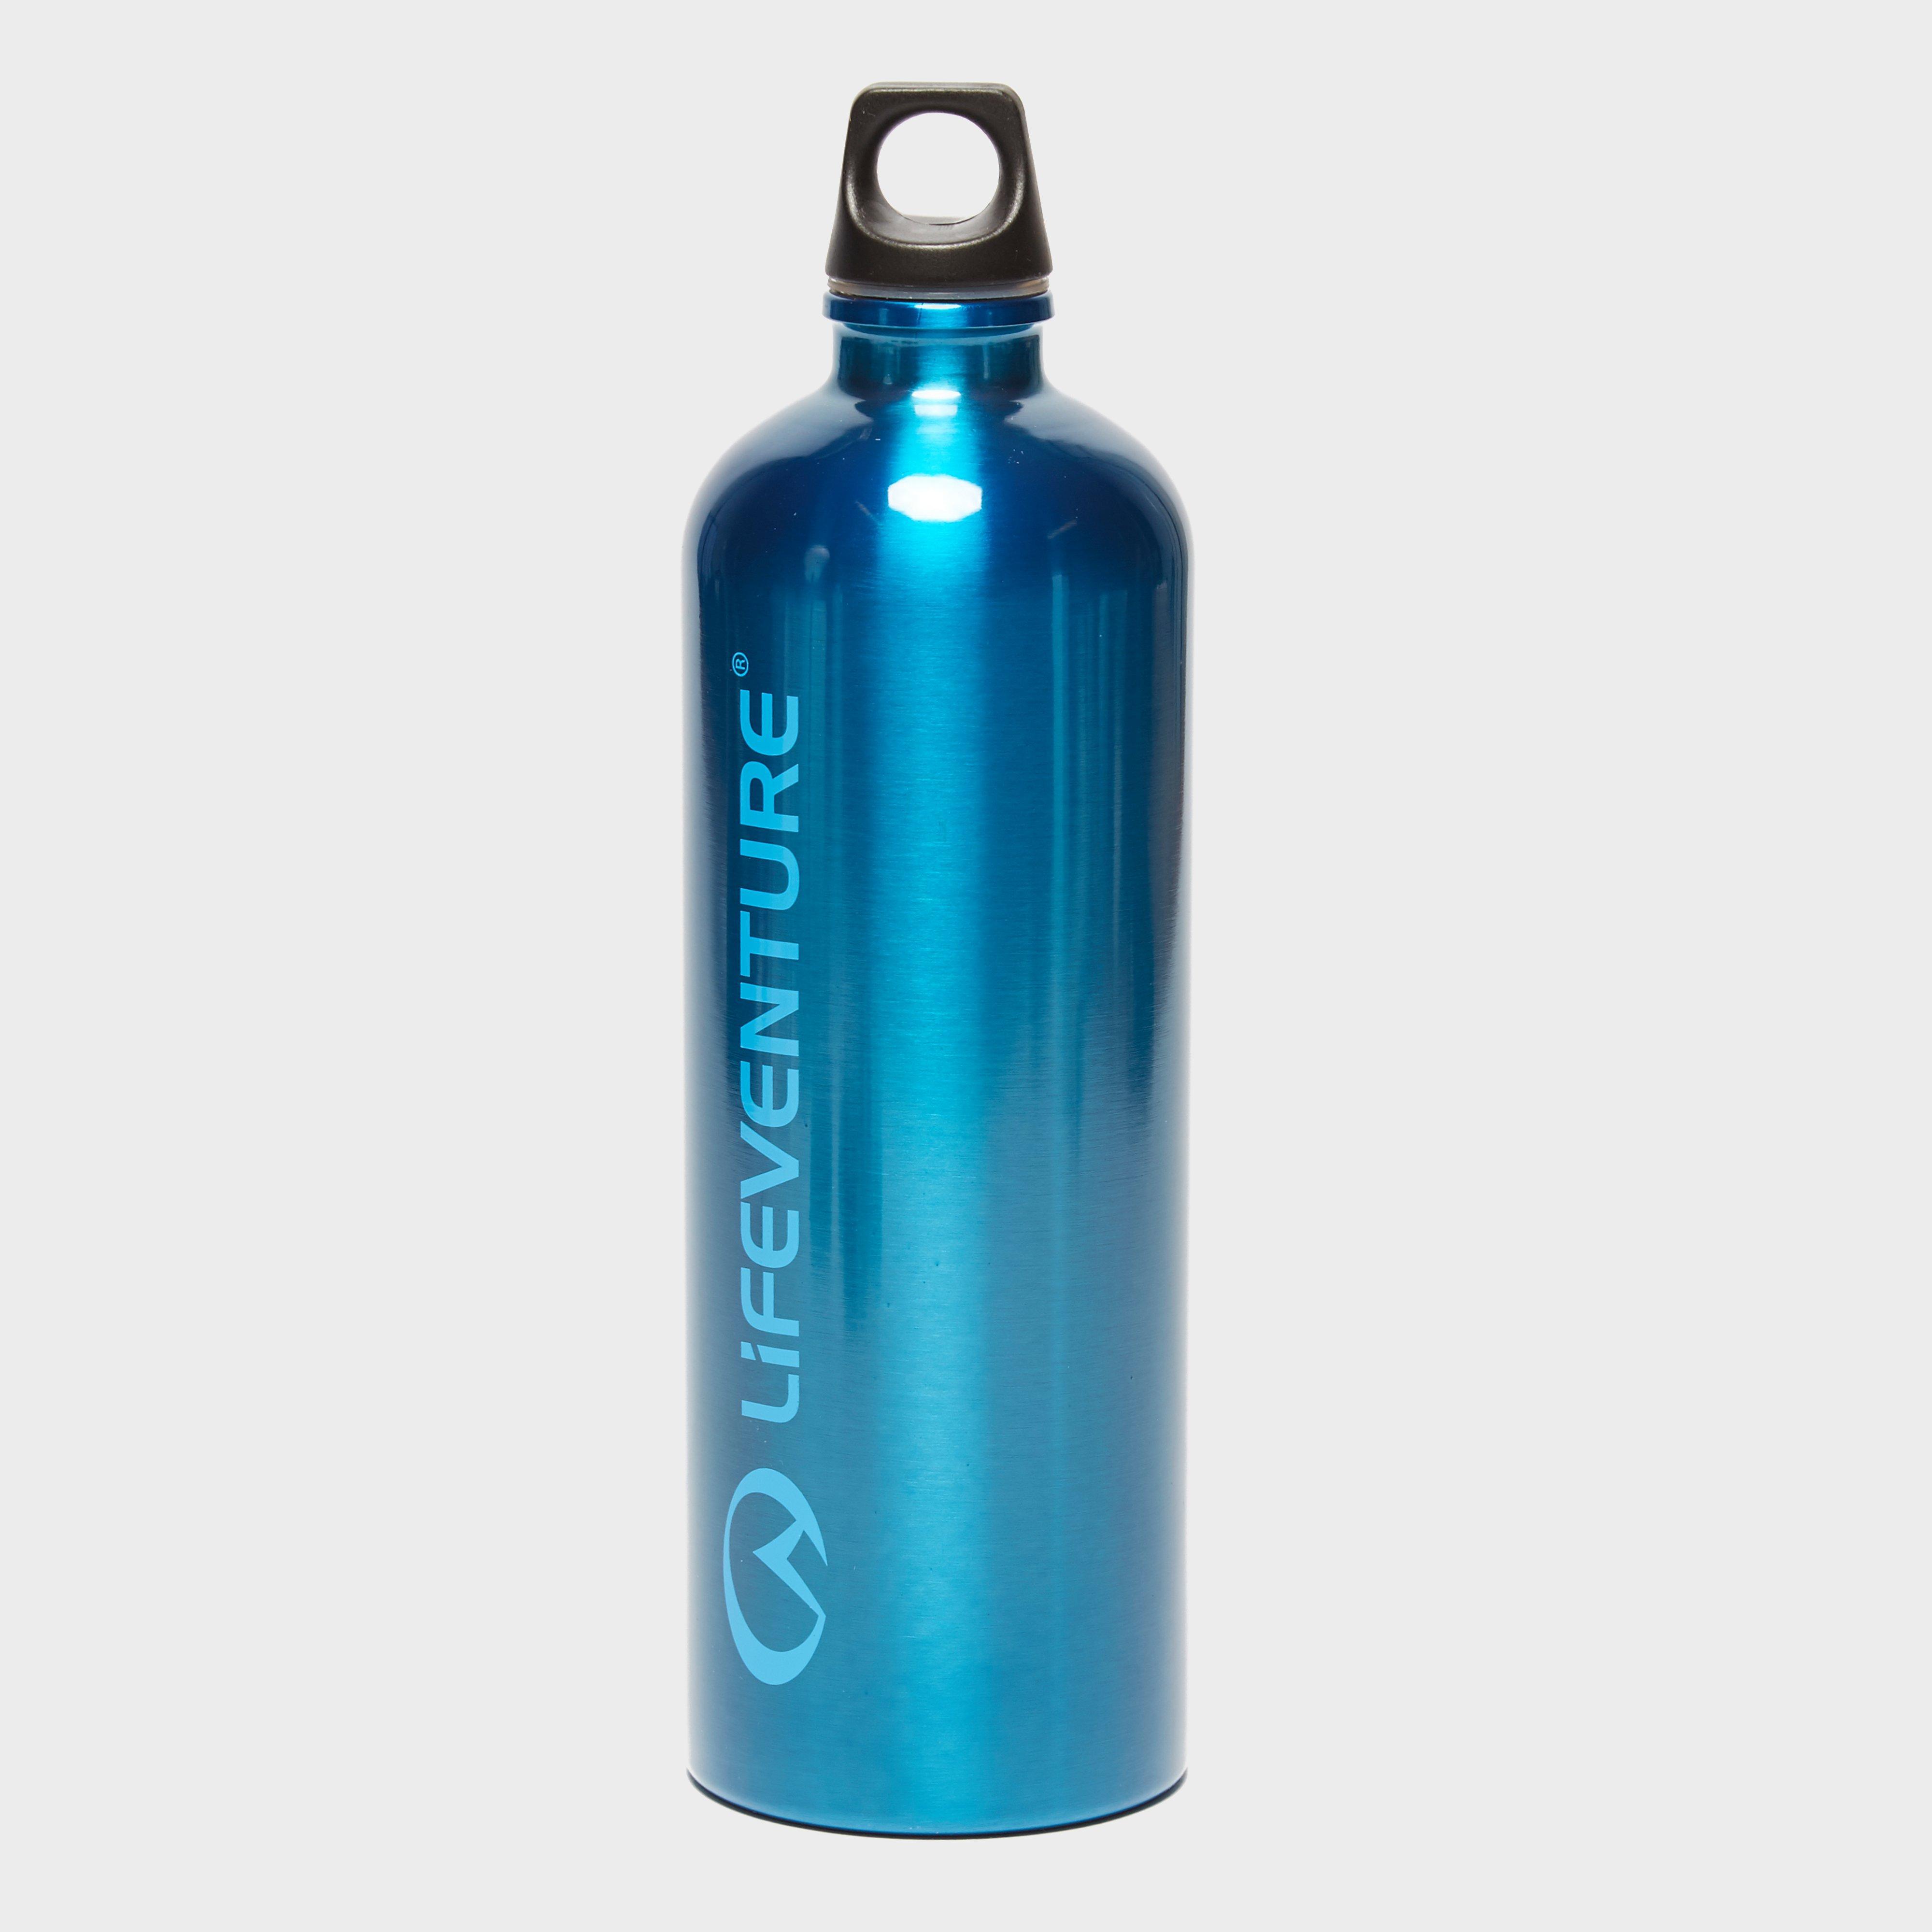 Lifeventure Stainless Steel 1L Bottle, Blue